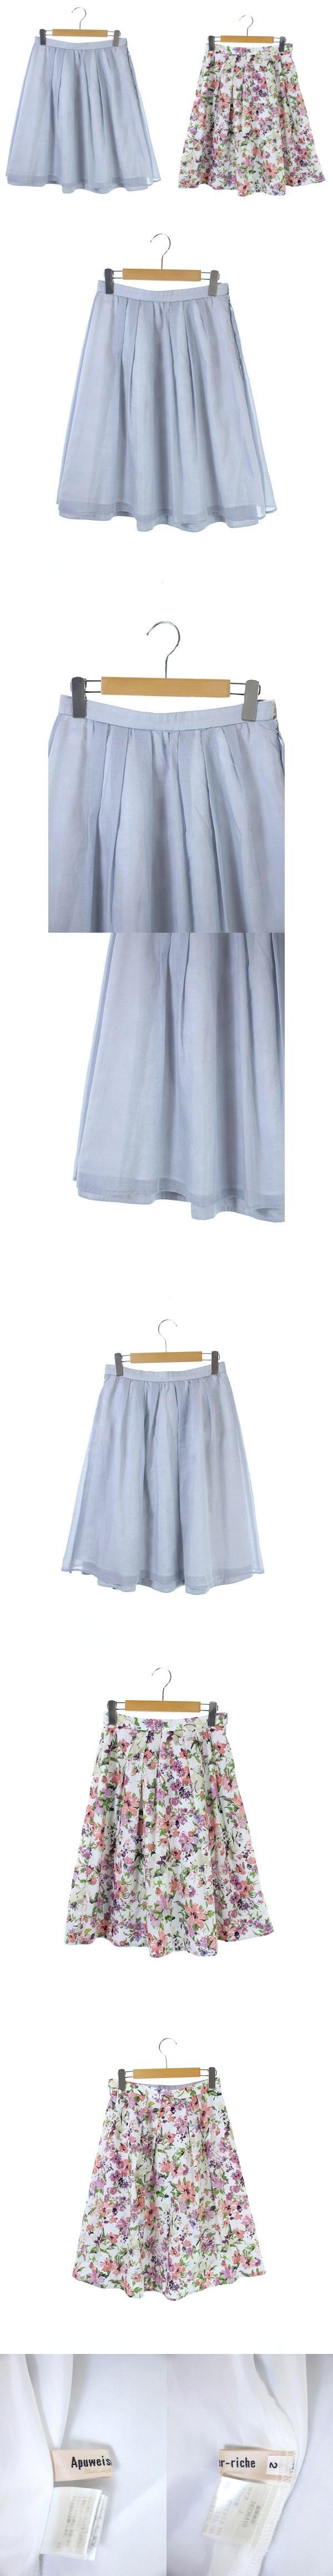 18SS リバーシブルスカート フレア 膝丈 花柄 無地 2 白 ピンク グレー /AA ■OS